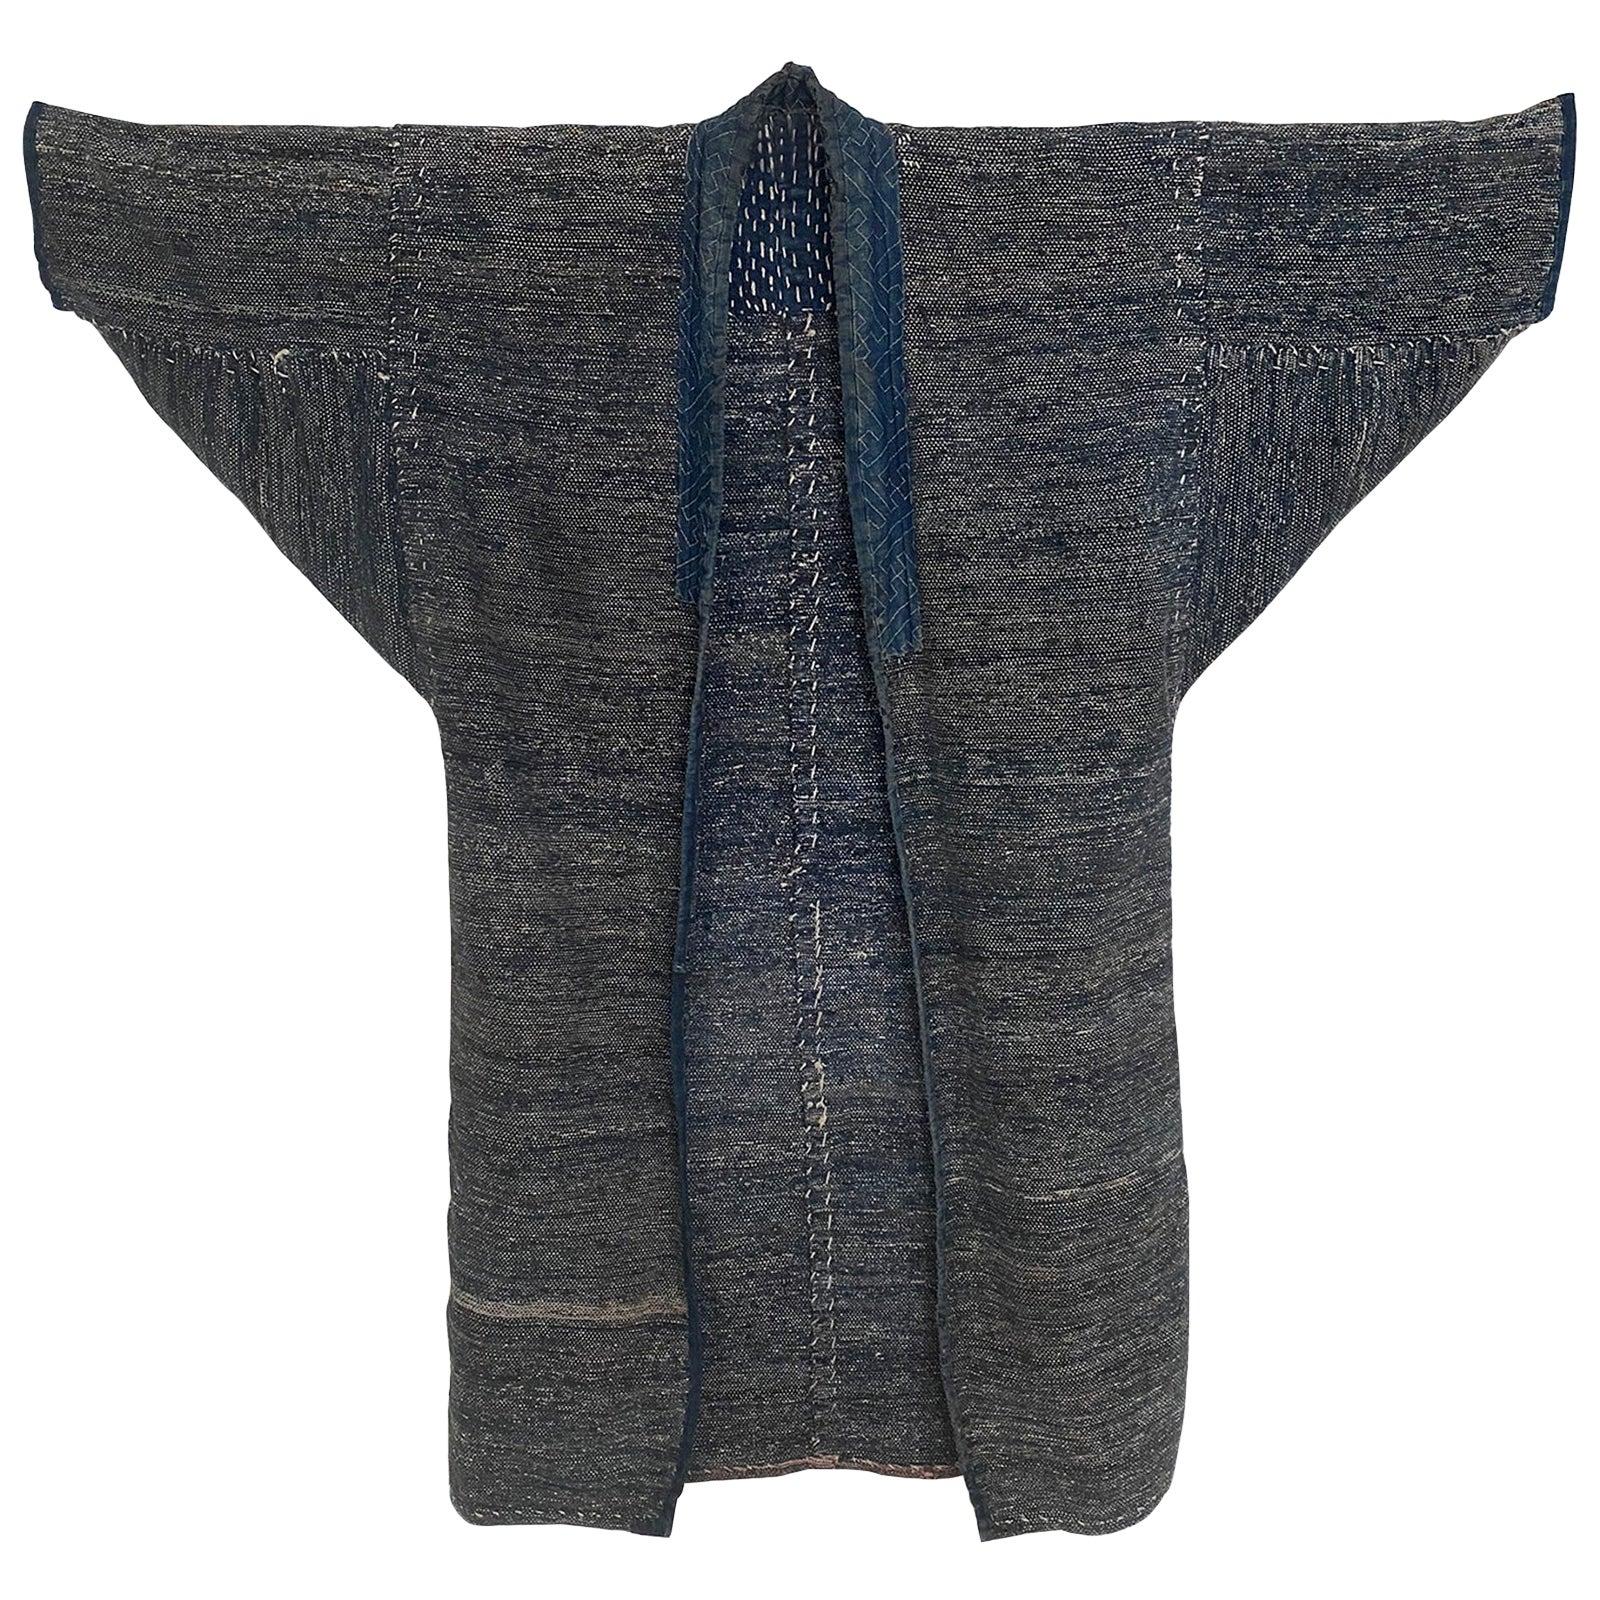 Saki-Ori Farmers Coat, Northern Japan, Meiji Period